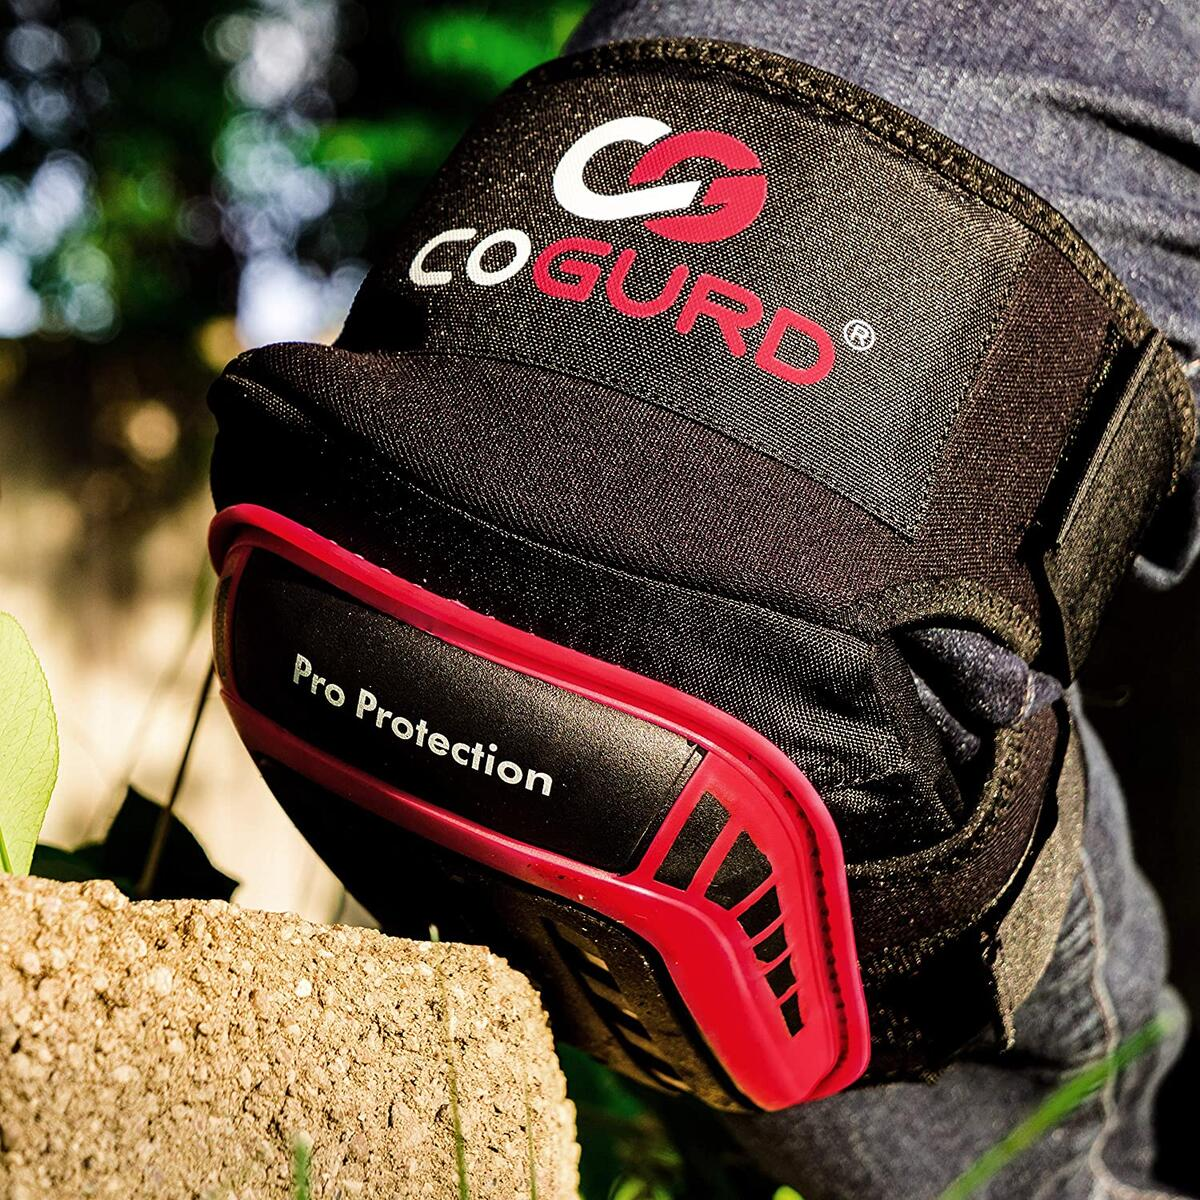 COGURD Professional Gel Knee Pads for Work Construction